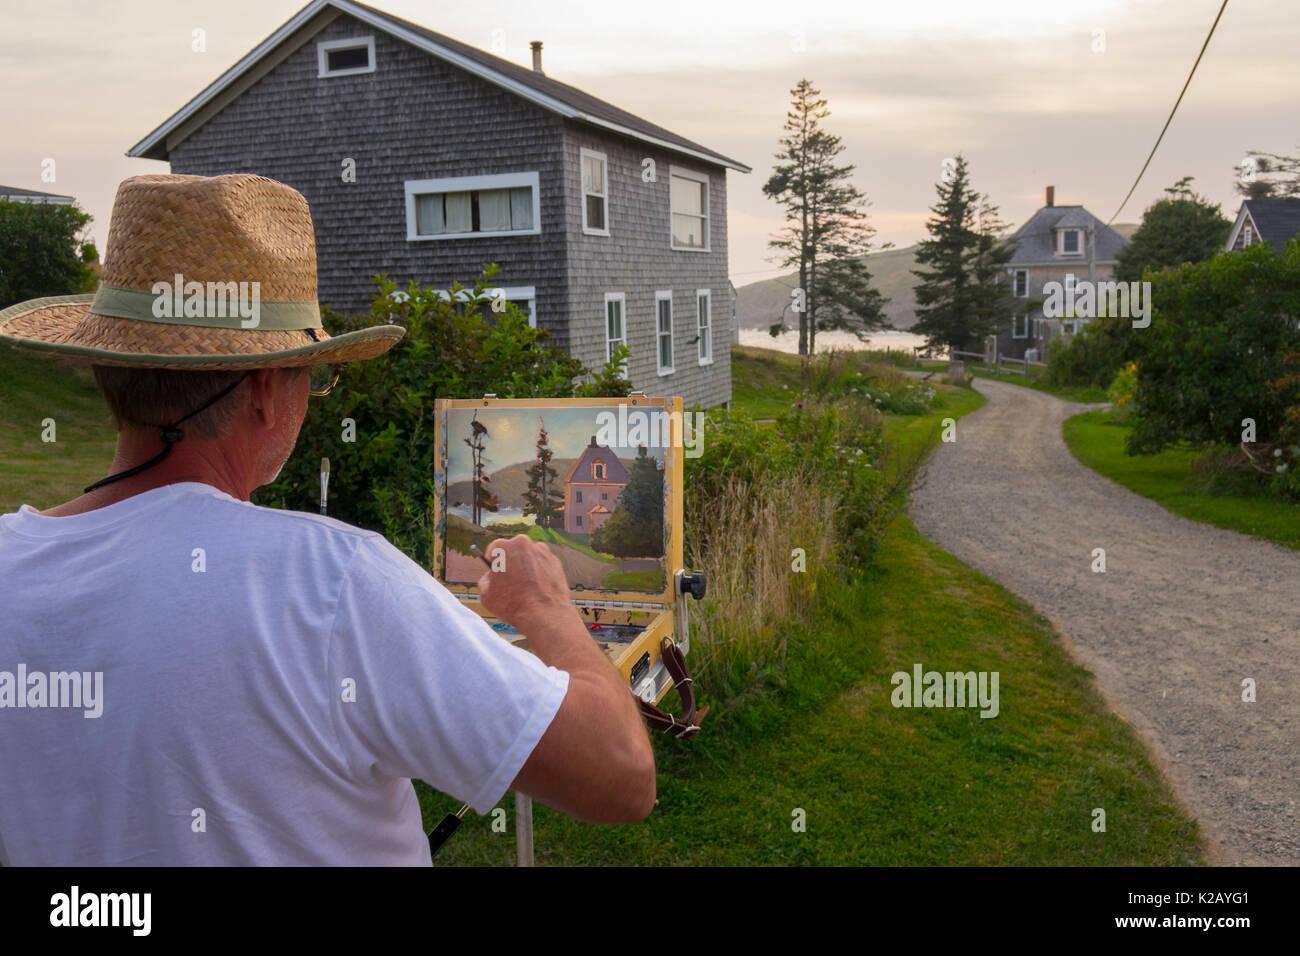 usa-maine-me-monhegan-island-an-artist-is-painting-a-home-a-gravel-K2AYG1.jpg